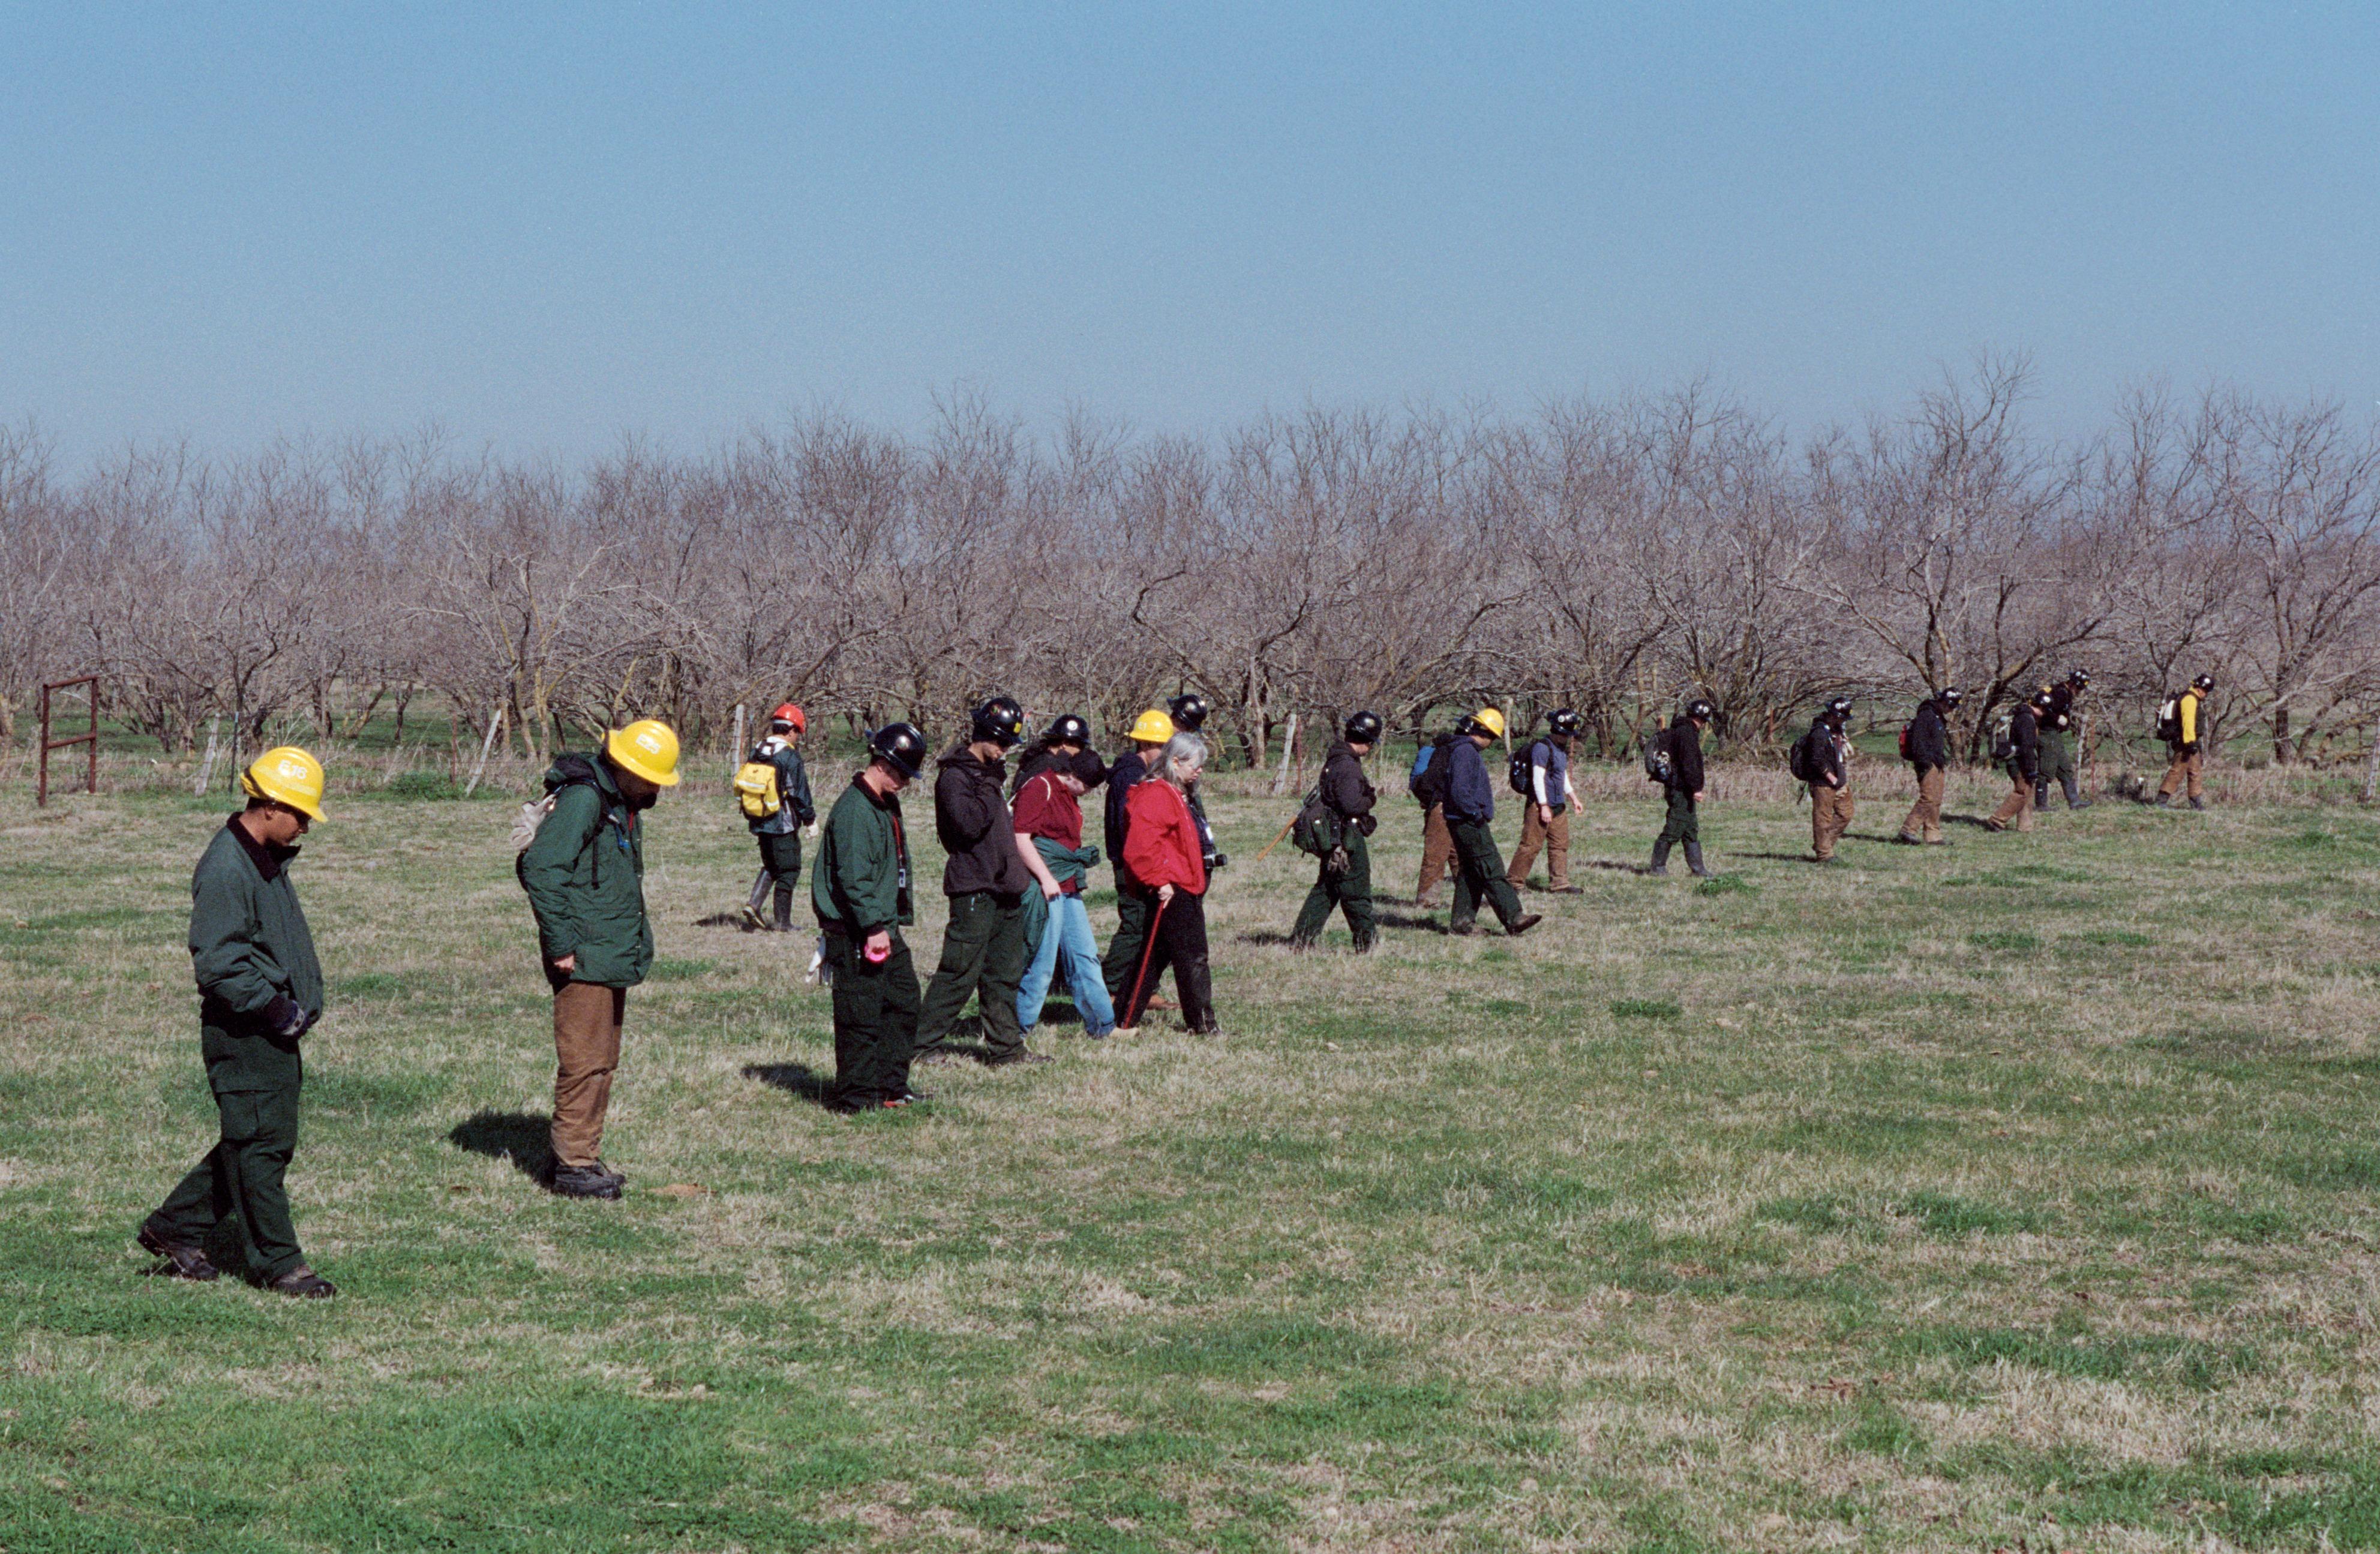 Volunteer Searchers Scour for Debris